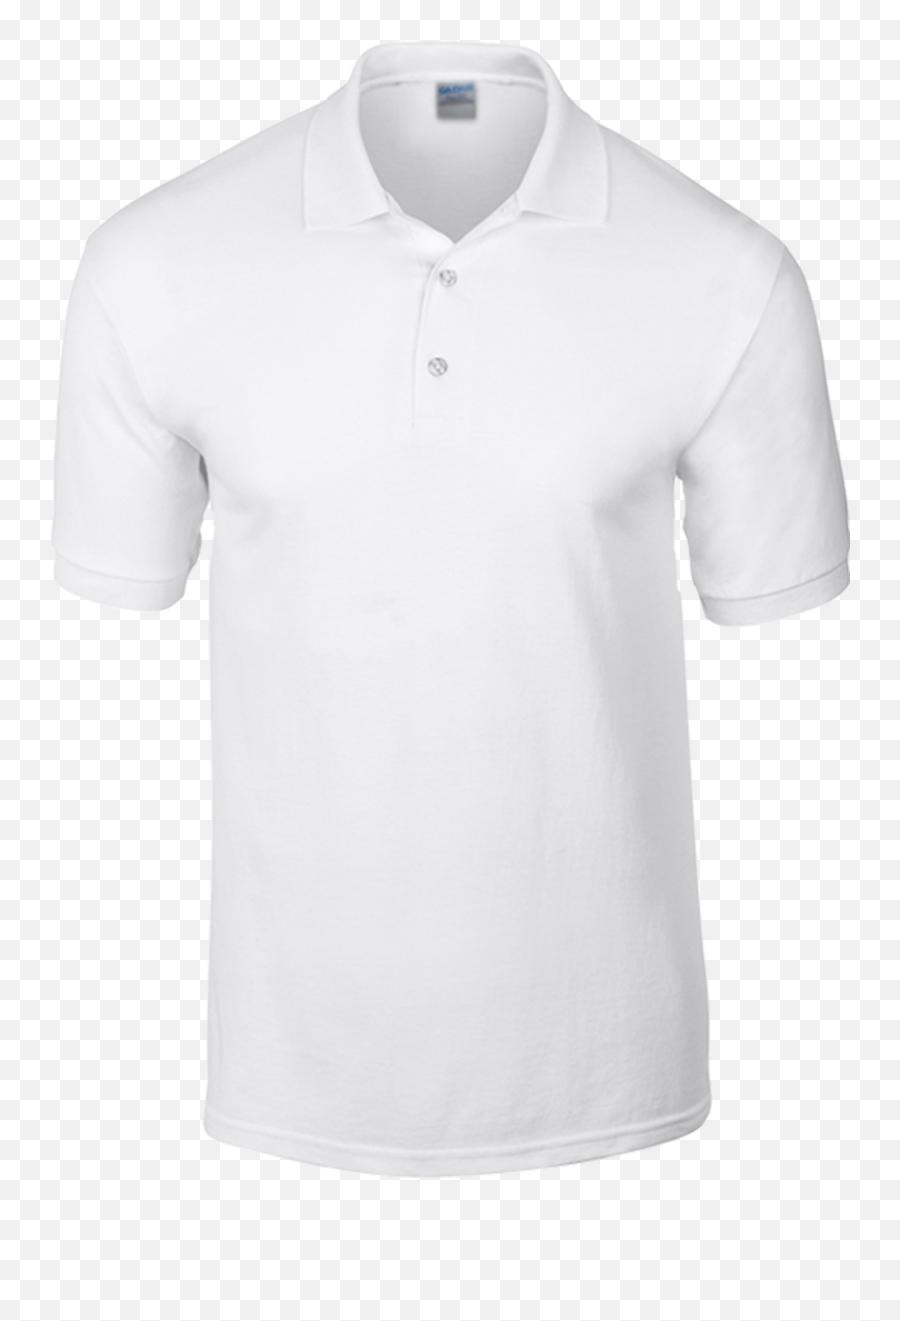 Where To Buy Cheap Plain Polo Shirts Rldm - White Blank T Shirt ...